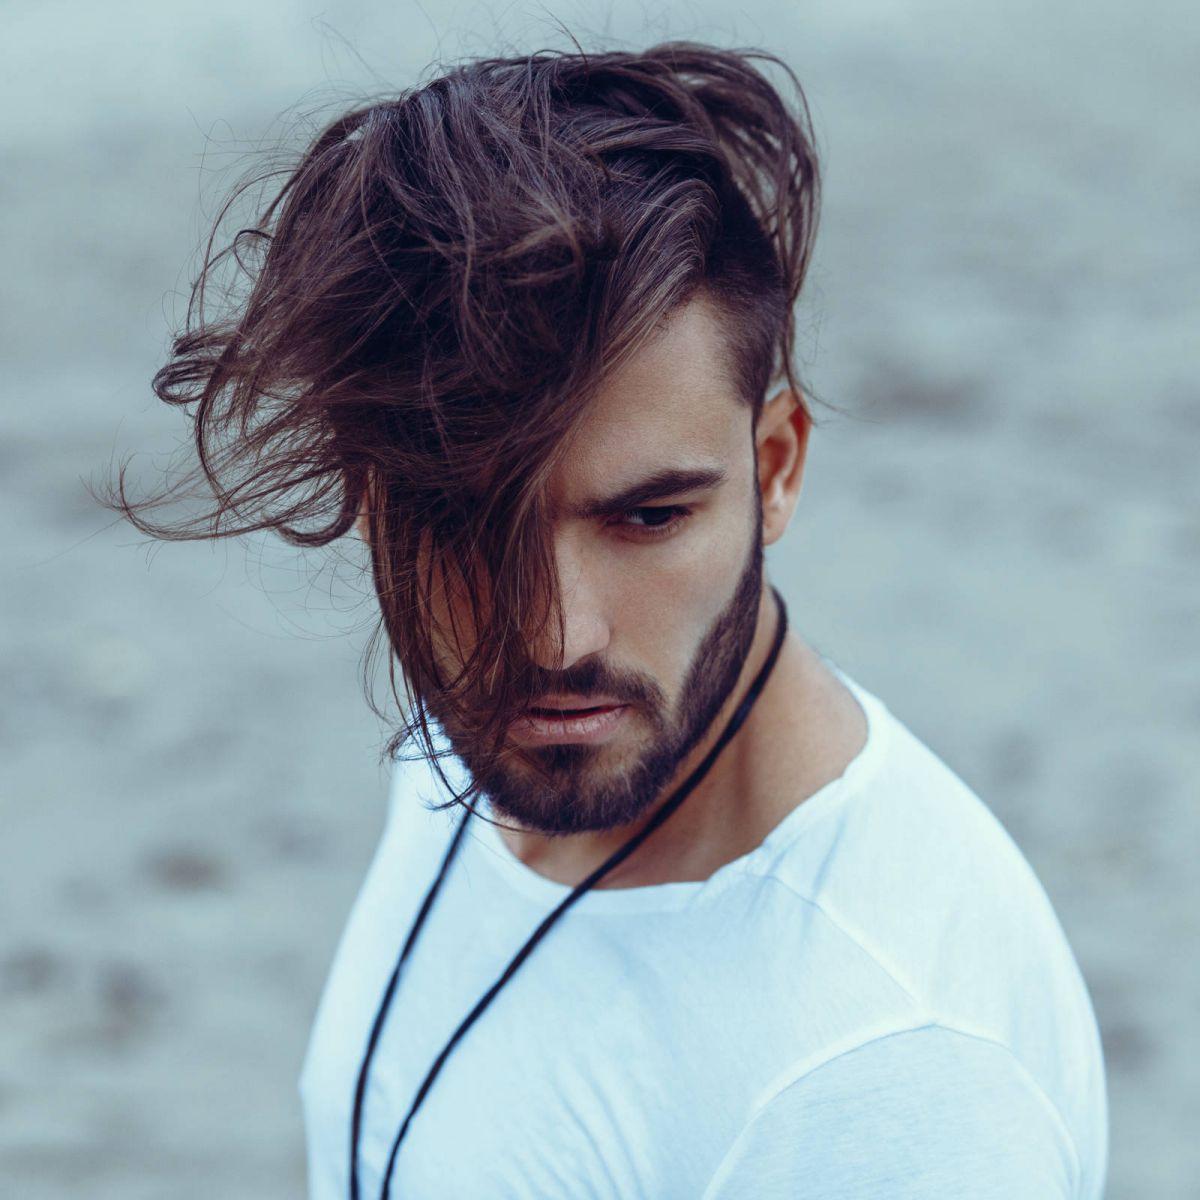 12+ Best Long Hairstyles For Men - Sensod